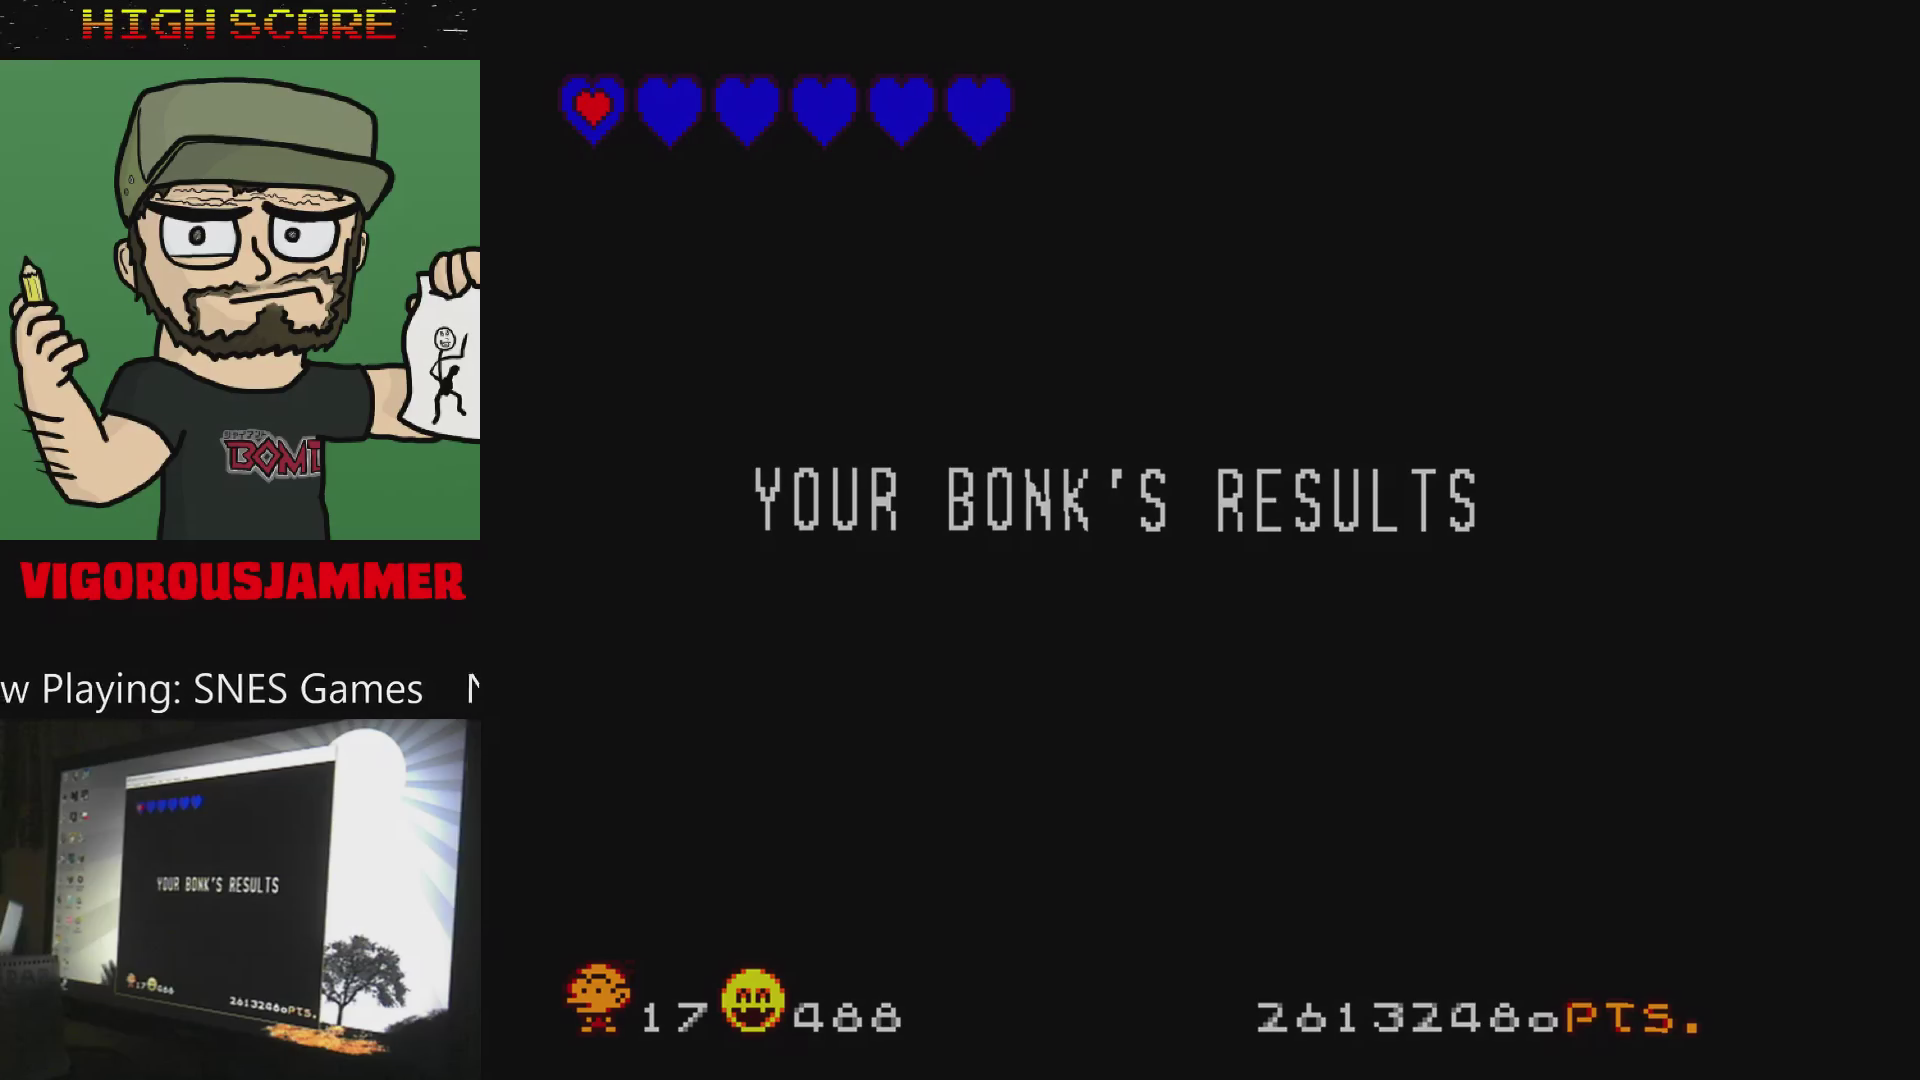 vigorousjammer: Super Bonk / Super B.C. Kid / Chou Genjin (SNES/Super Famicom Emulated) 26,132,480 points on 2015-09-05 23:20:11